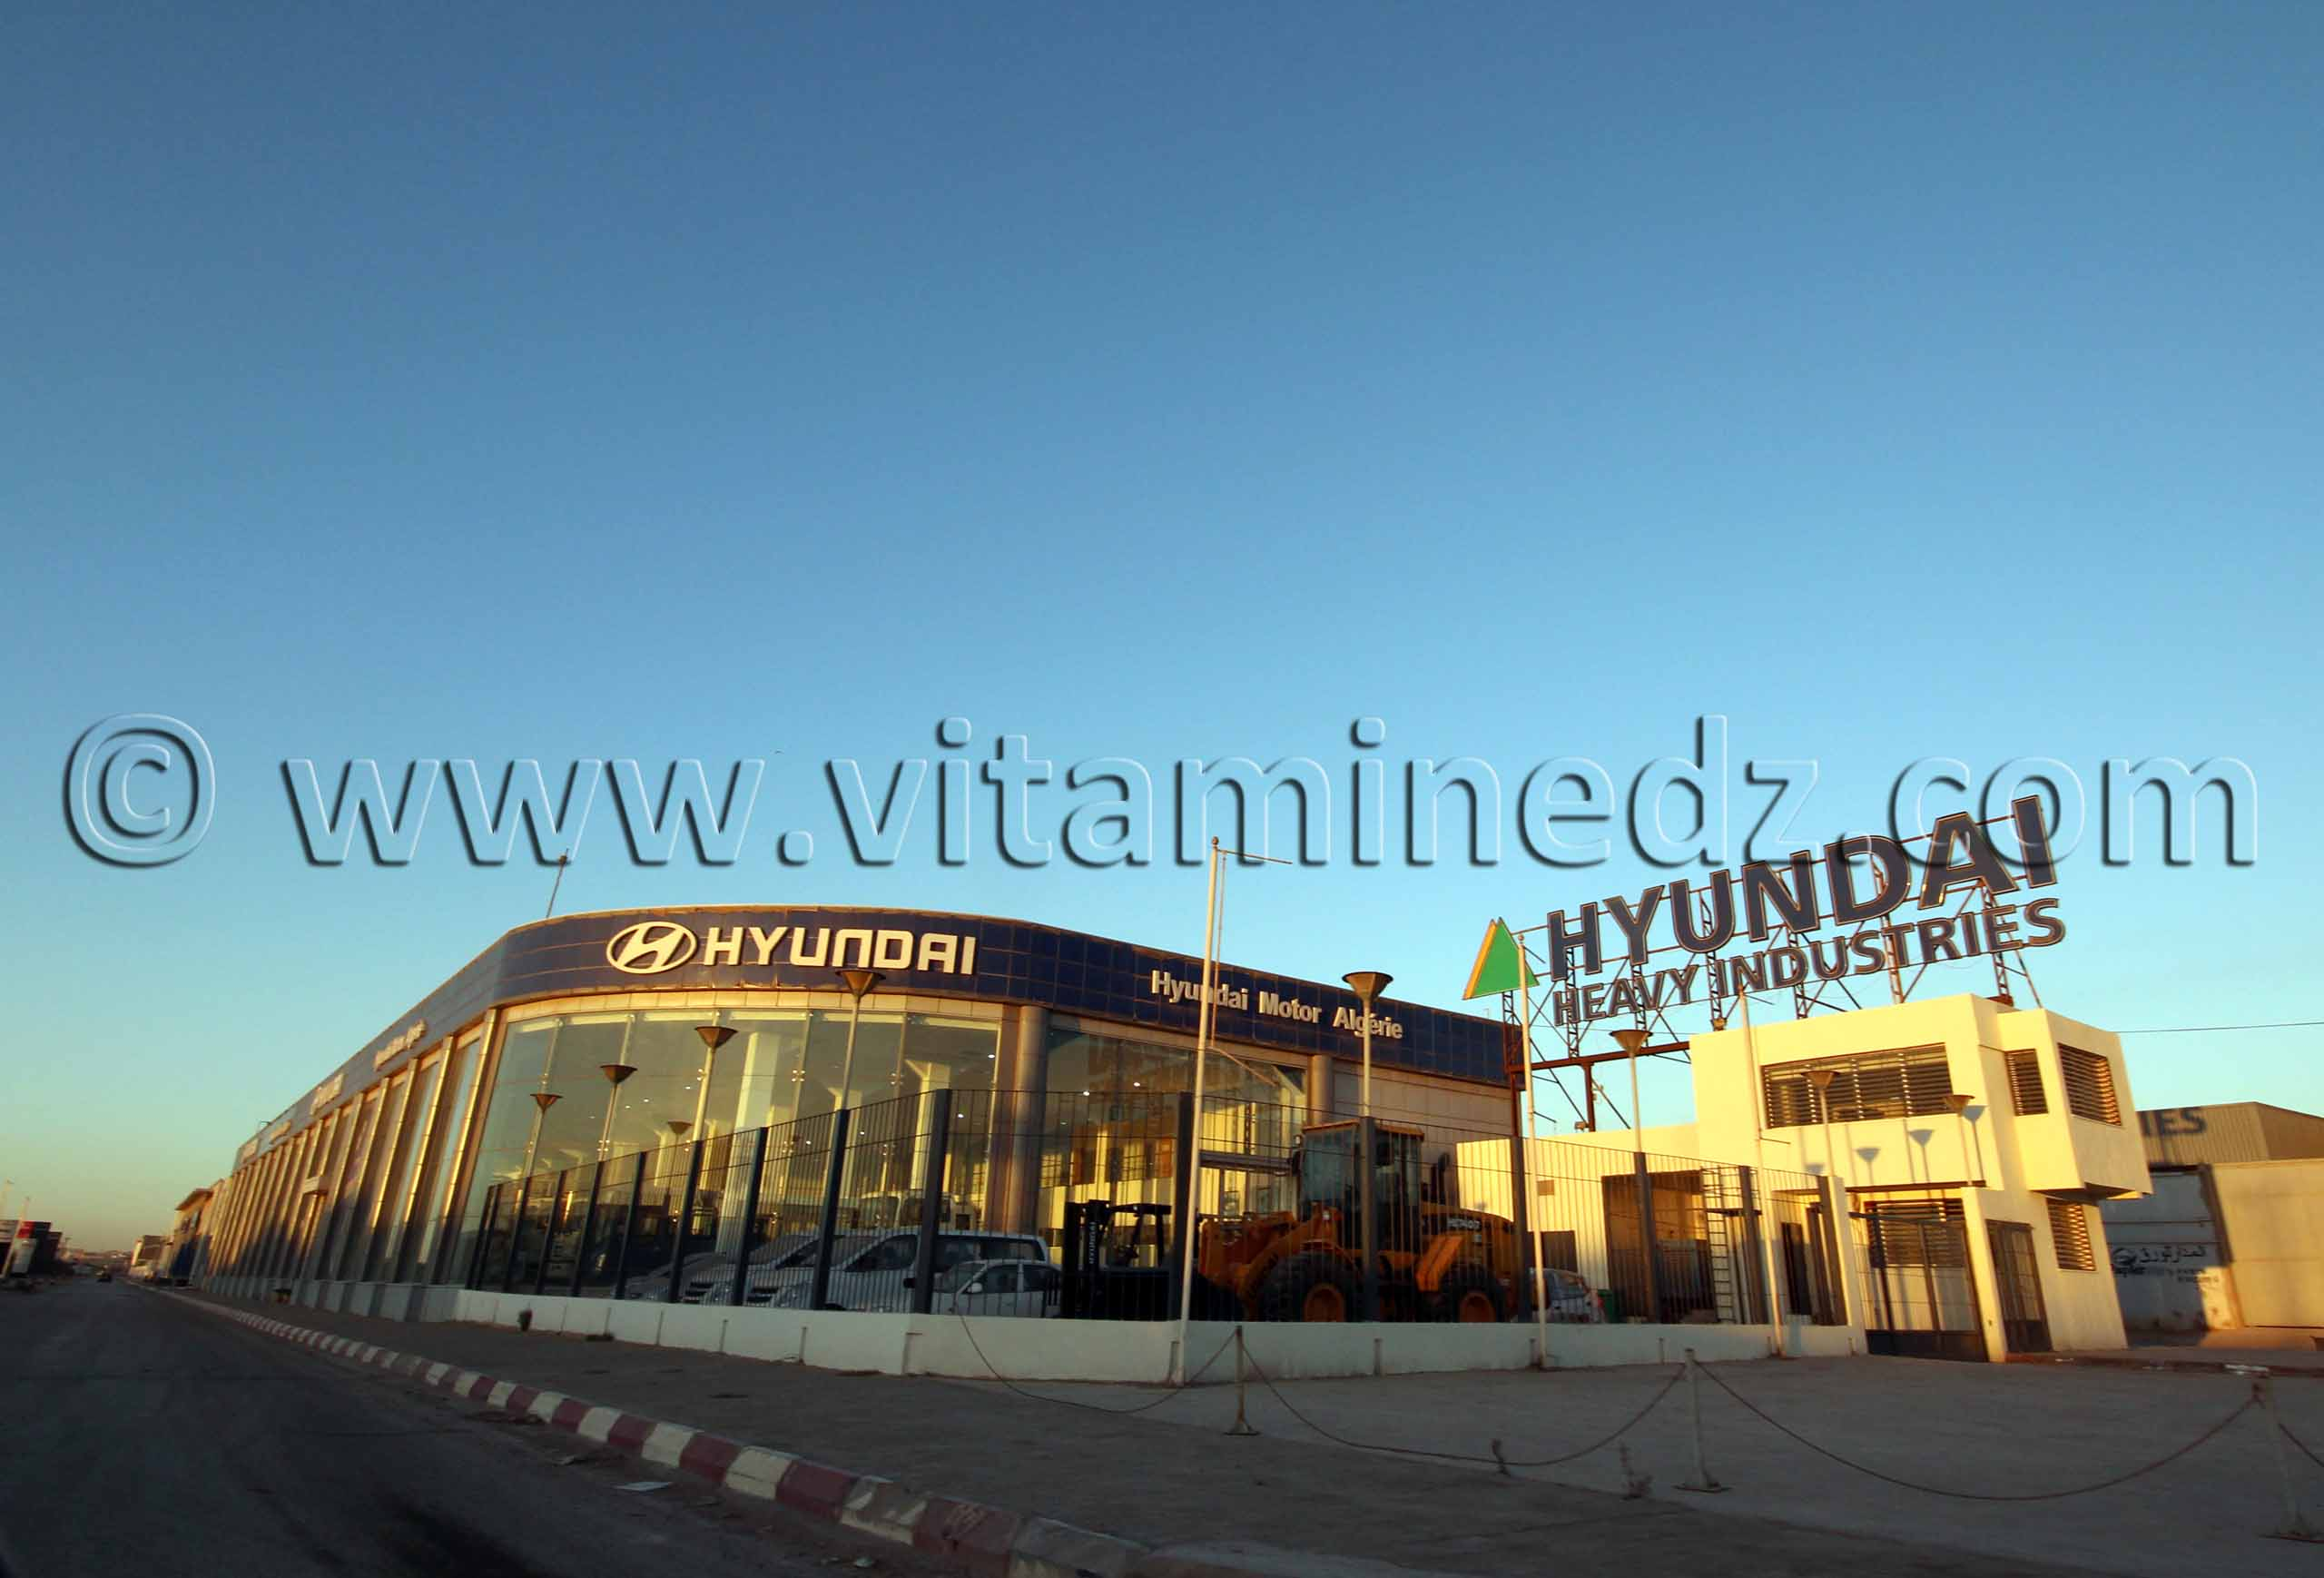 hyundai industries maison auto concessionnaire oran alg rie. Black Bedroom Furniture Sets. Home Design Ideas